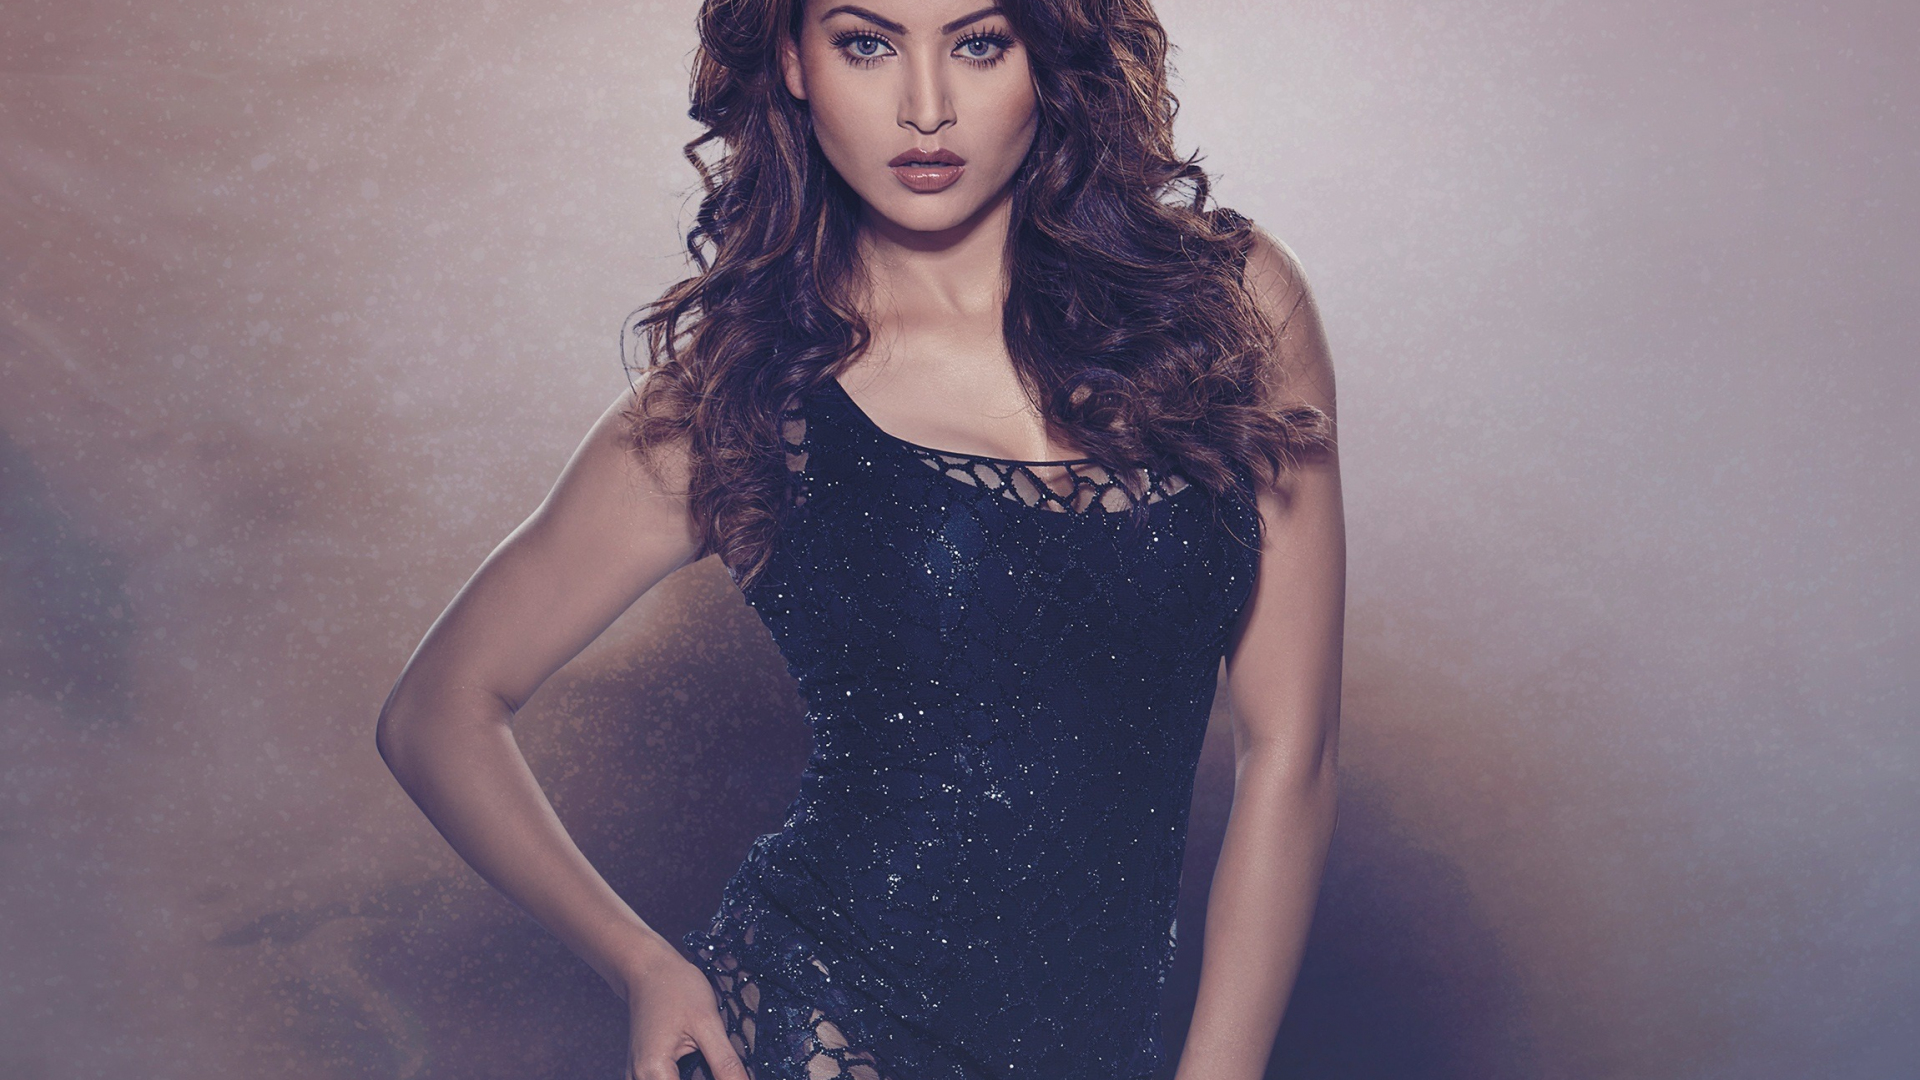 Download 1920x1080 Wallpaper Urvashi Rautela Hate Story 4 Actress